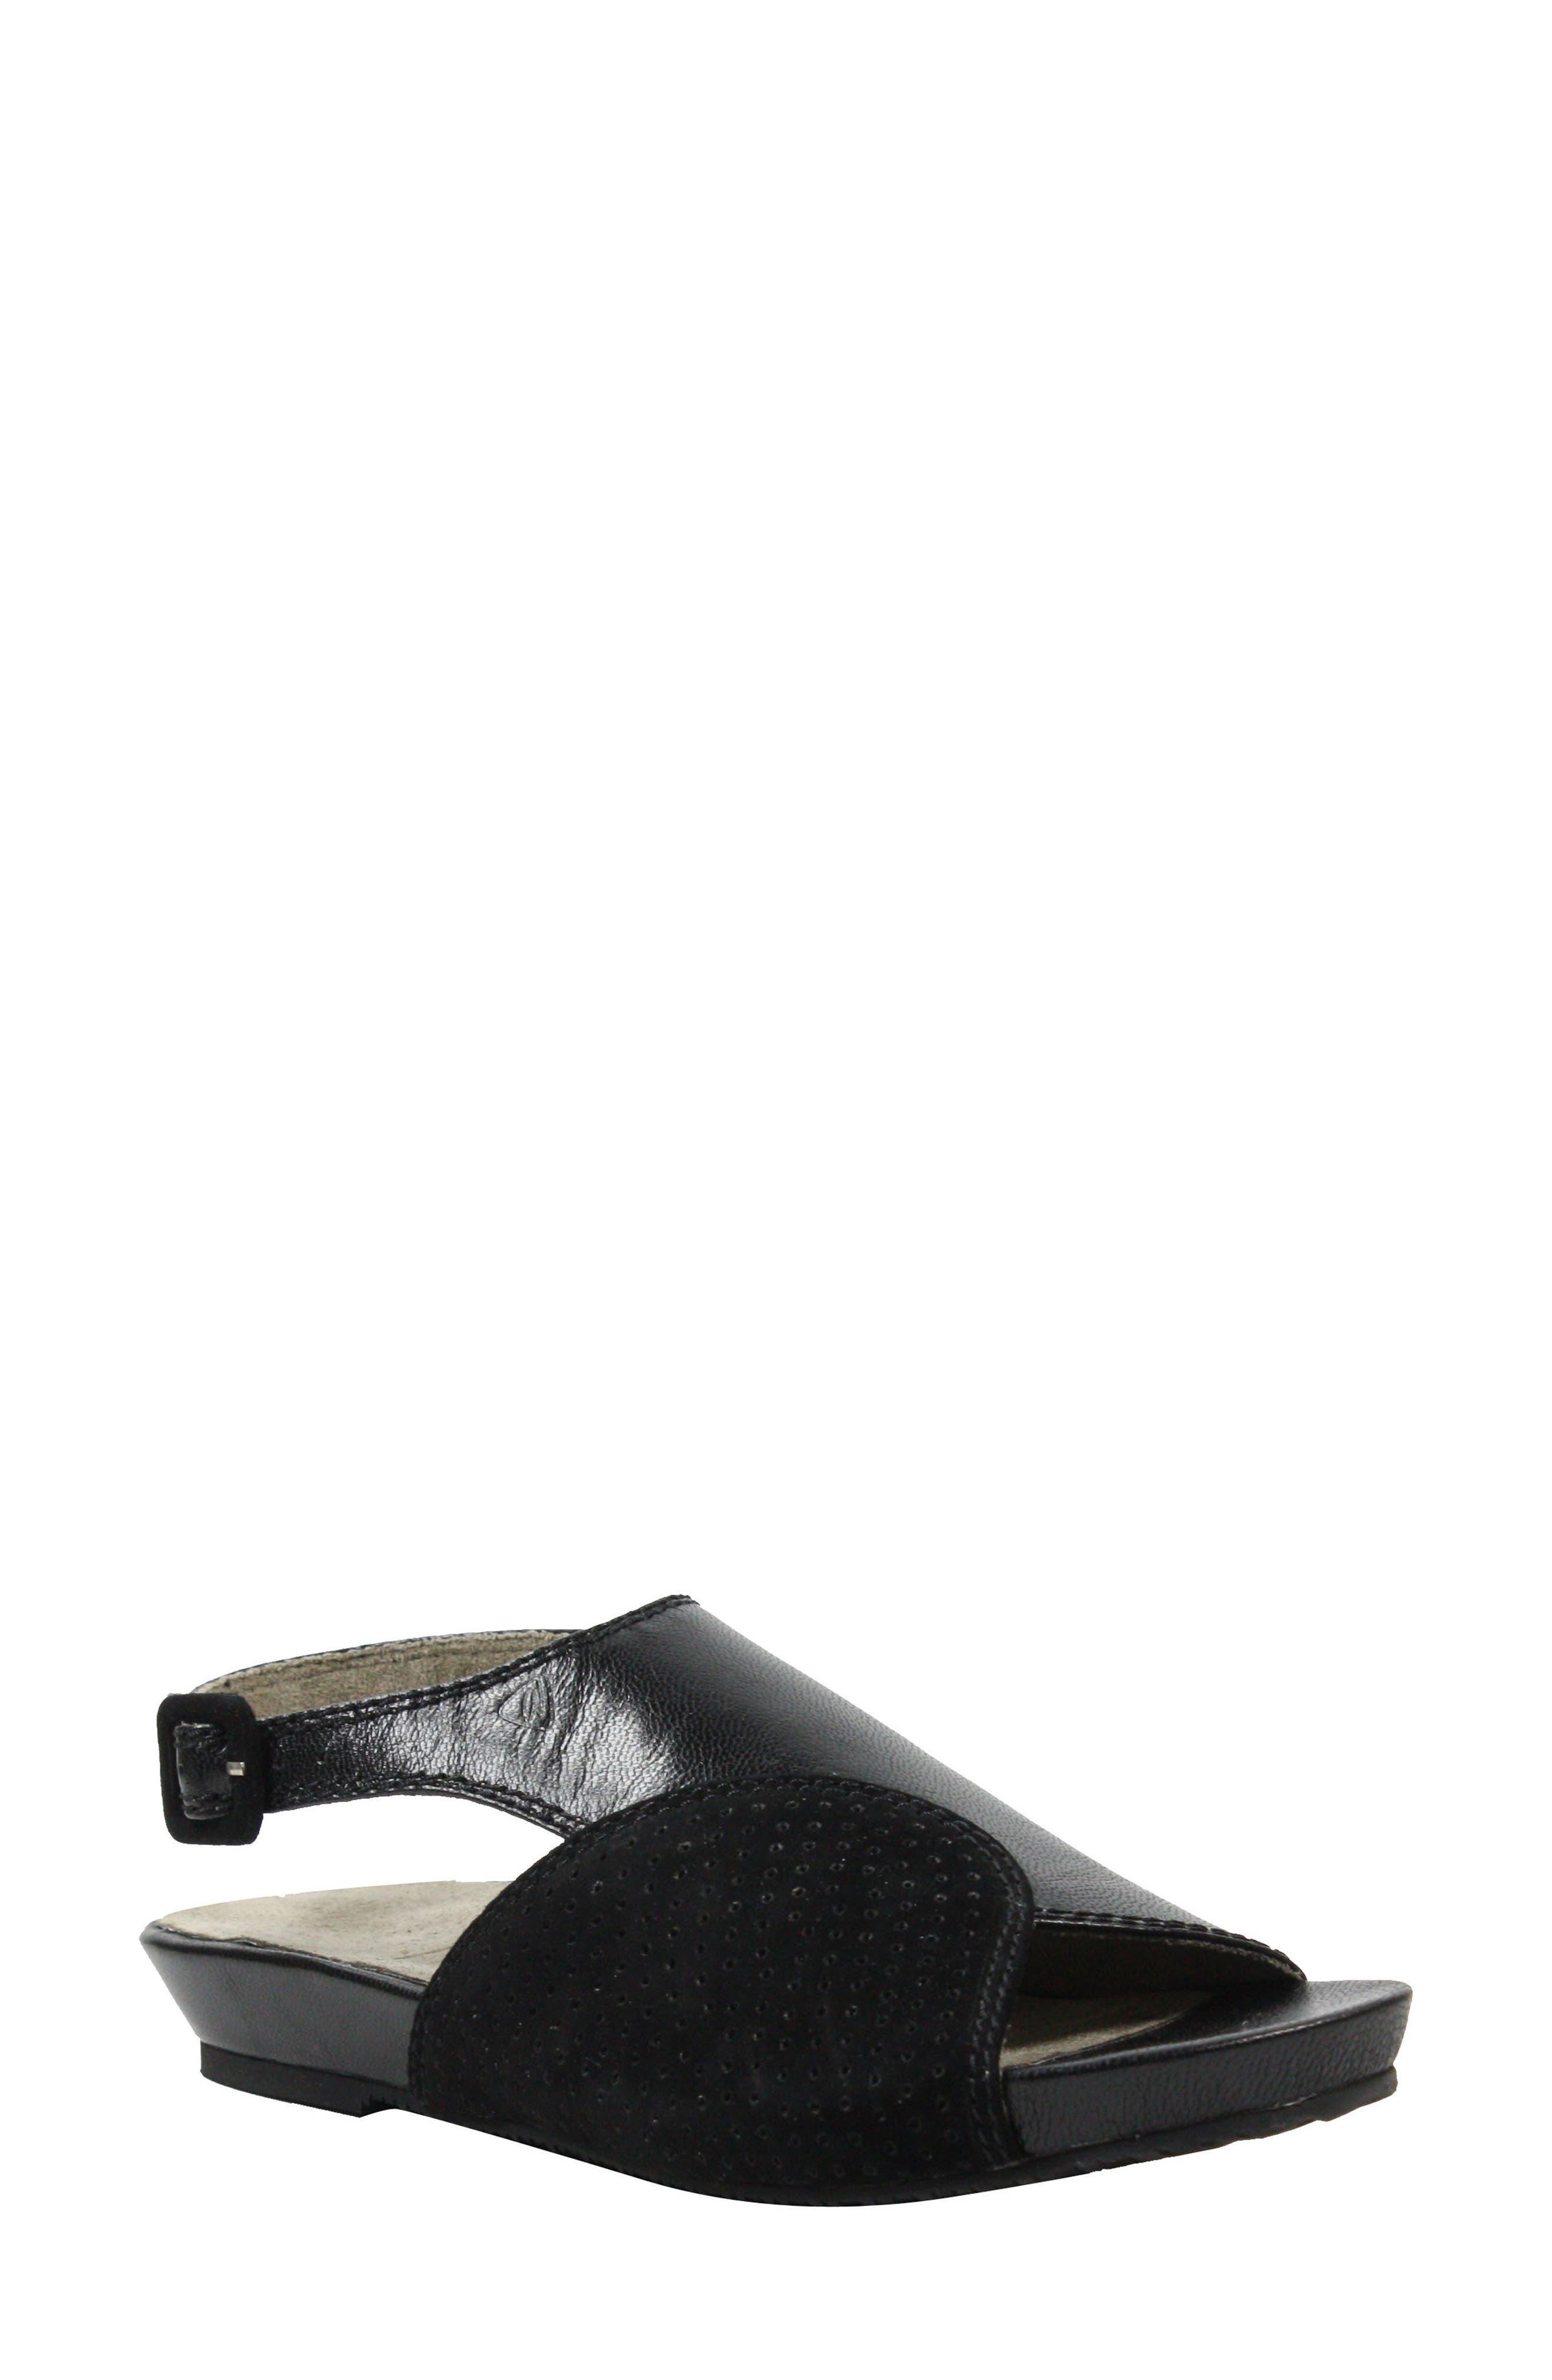 Dalenna Ankle Strap Sandal,                         Main,                         color, Black Leather